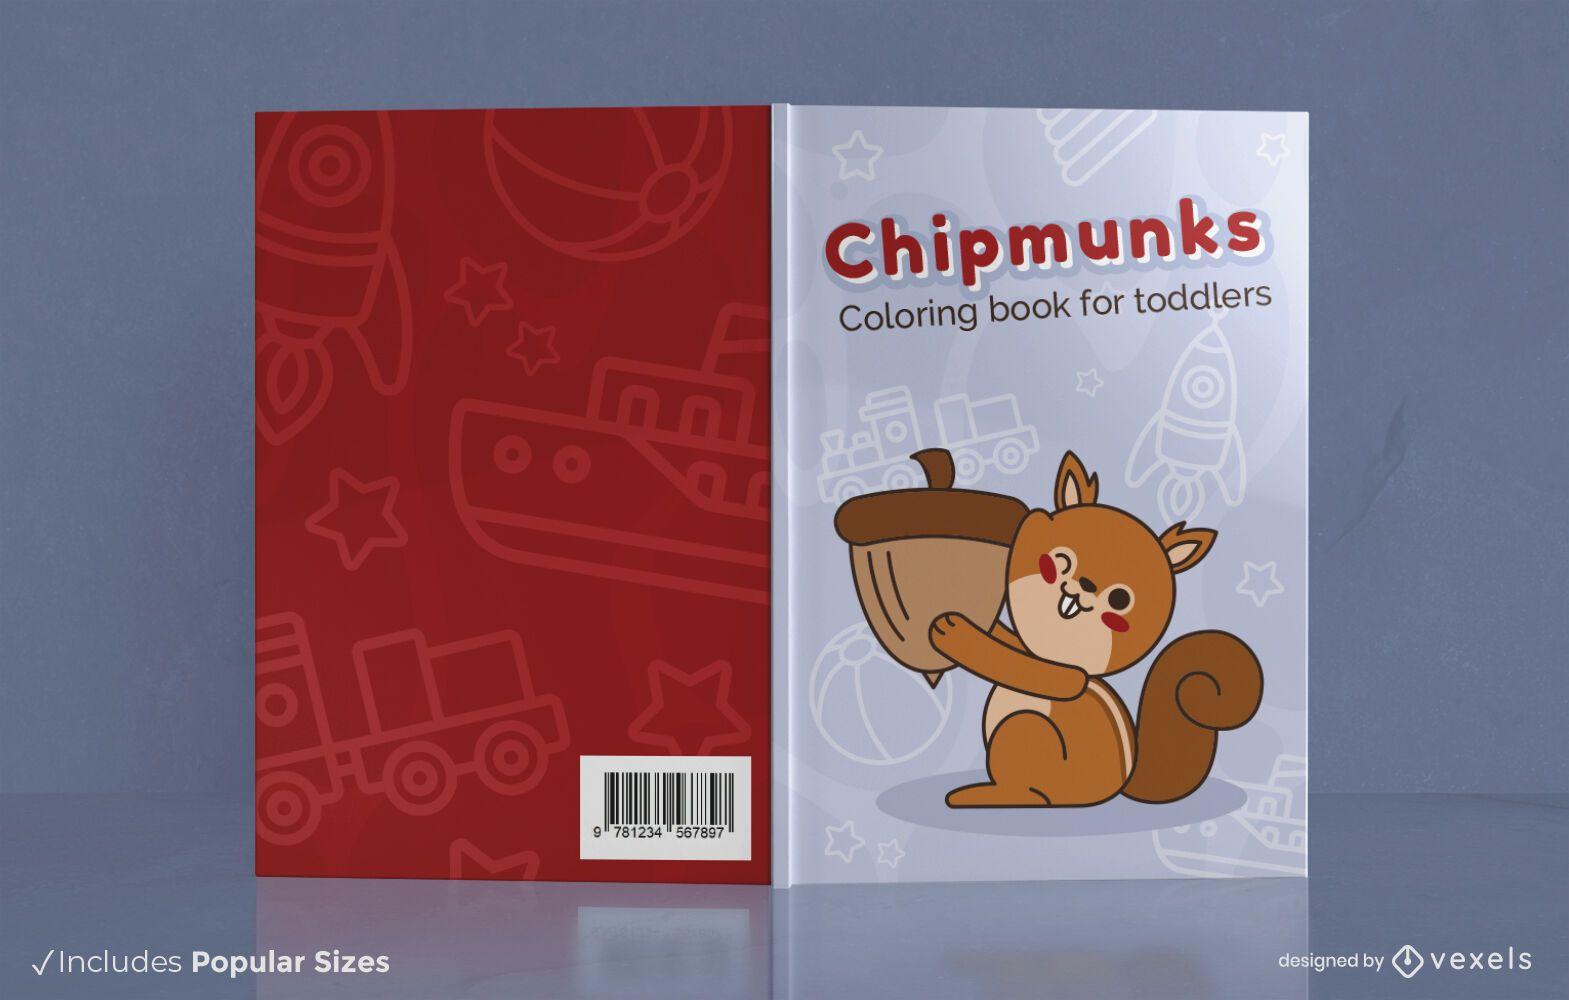 Chipmunk coloring book cover design